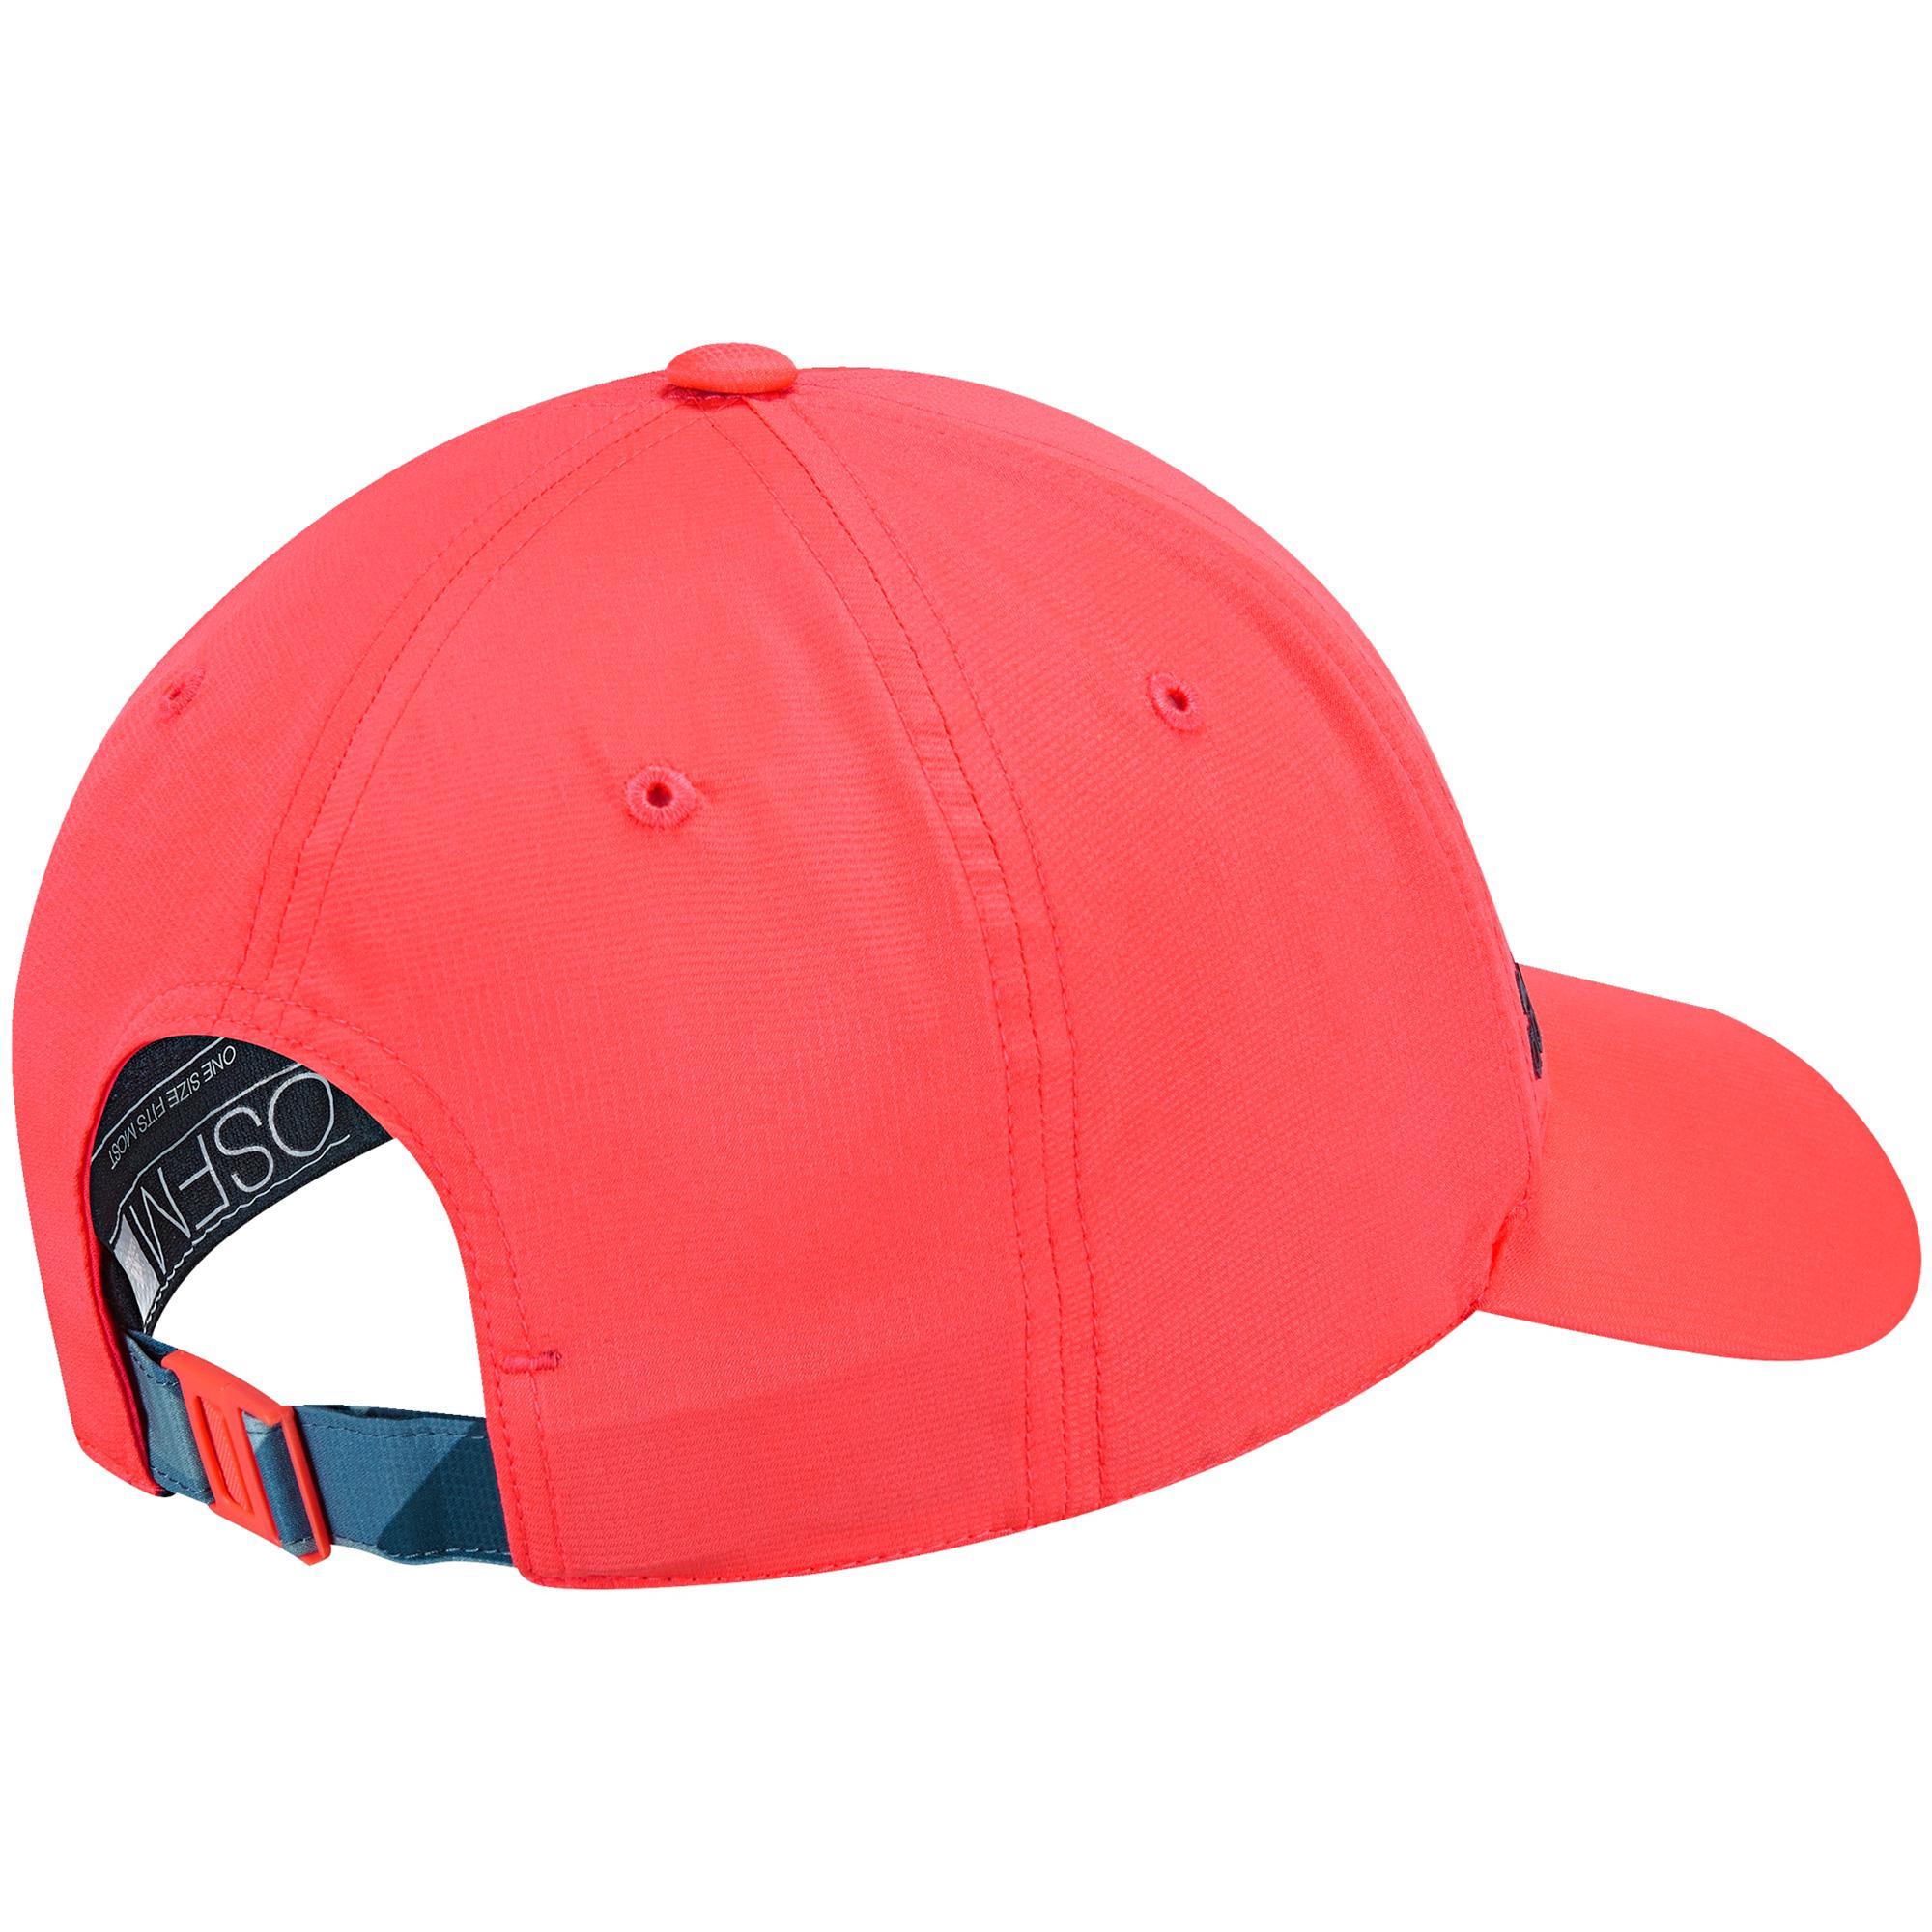 Adidas Tennis Cap - Flash Red - Tennisnuts.com 6a1f9886461